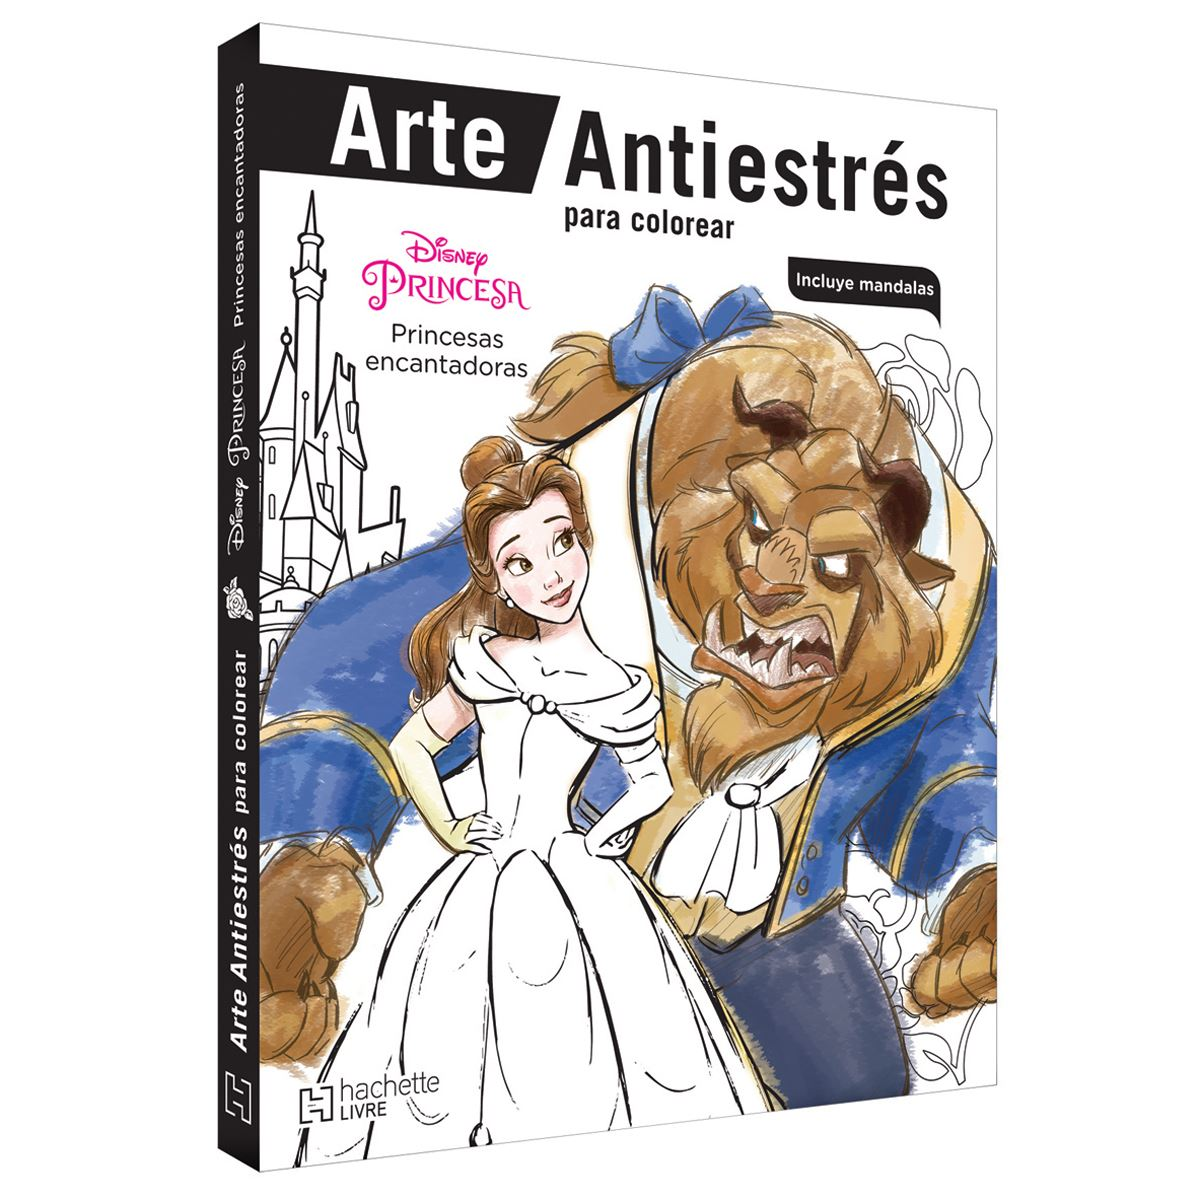 Disney princesas encantadoras